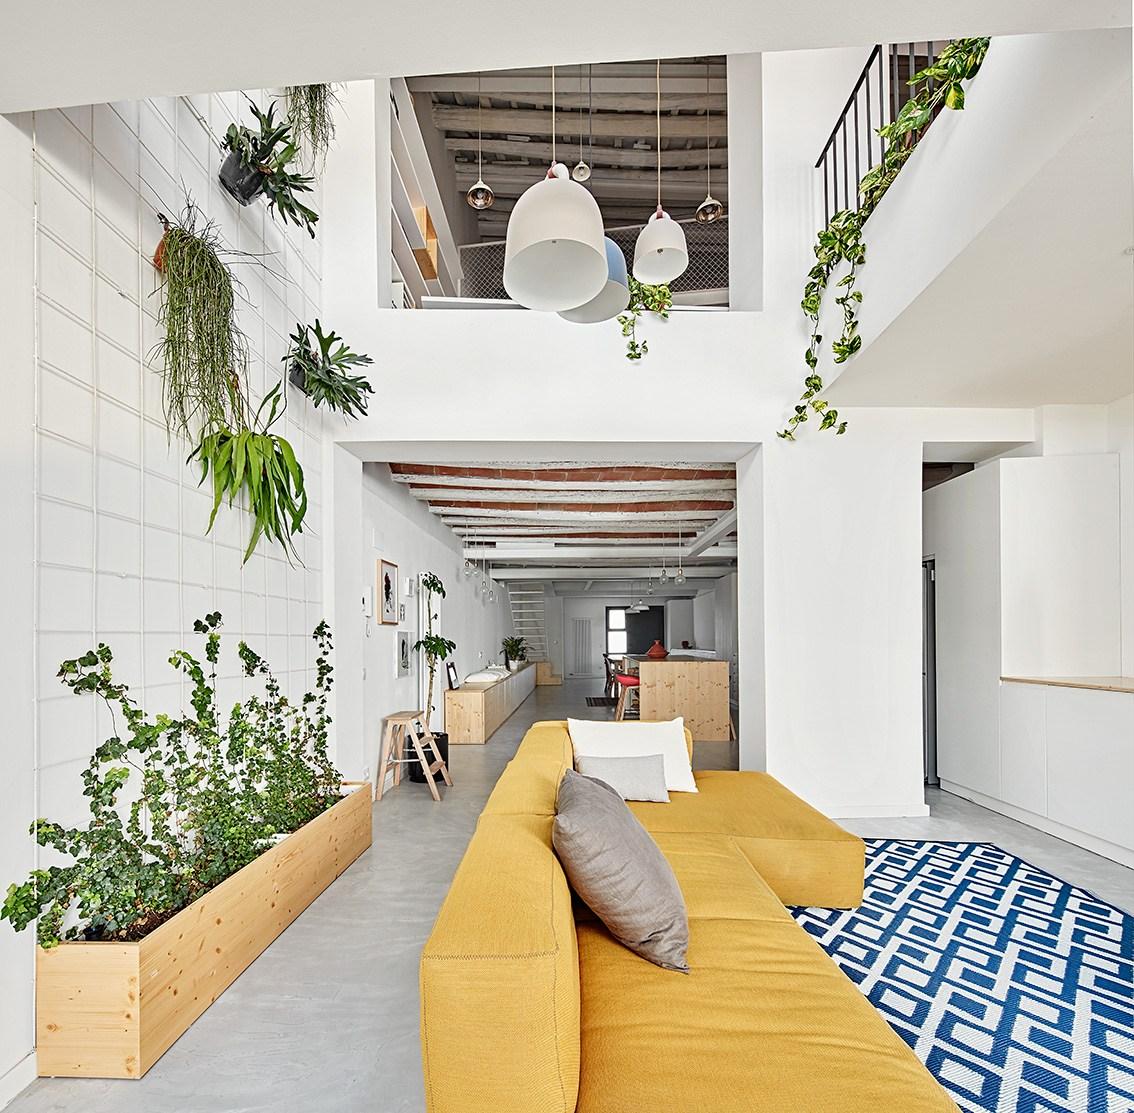 pix6-1 Scandinavian living room ideas that look fantastic